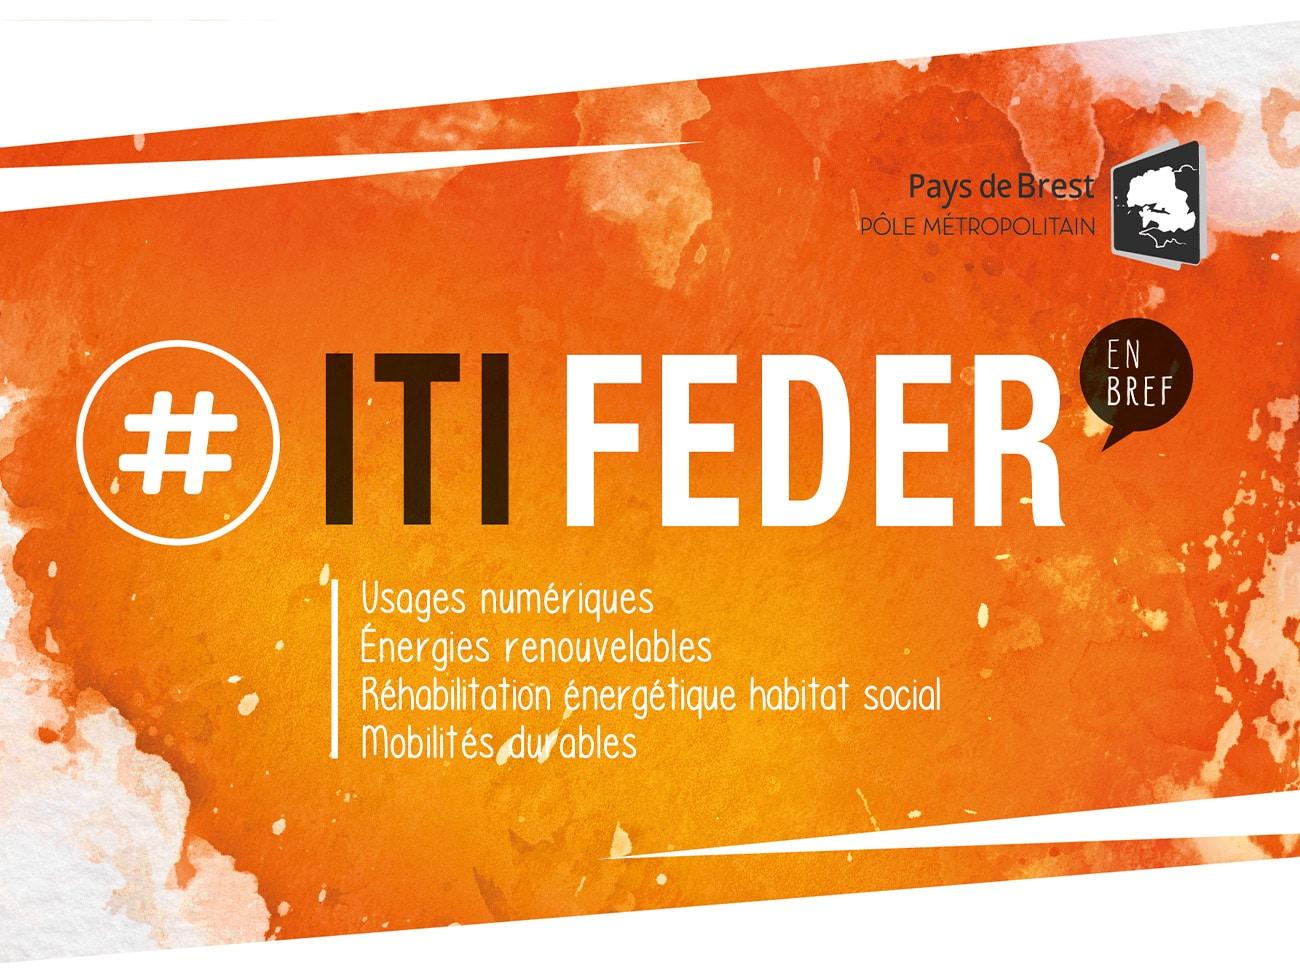 2-pole-metropolitain-campagne-fonds-communication-bretagne-lorient-IIT-FEDER